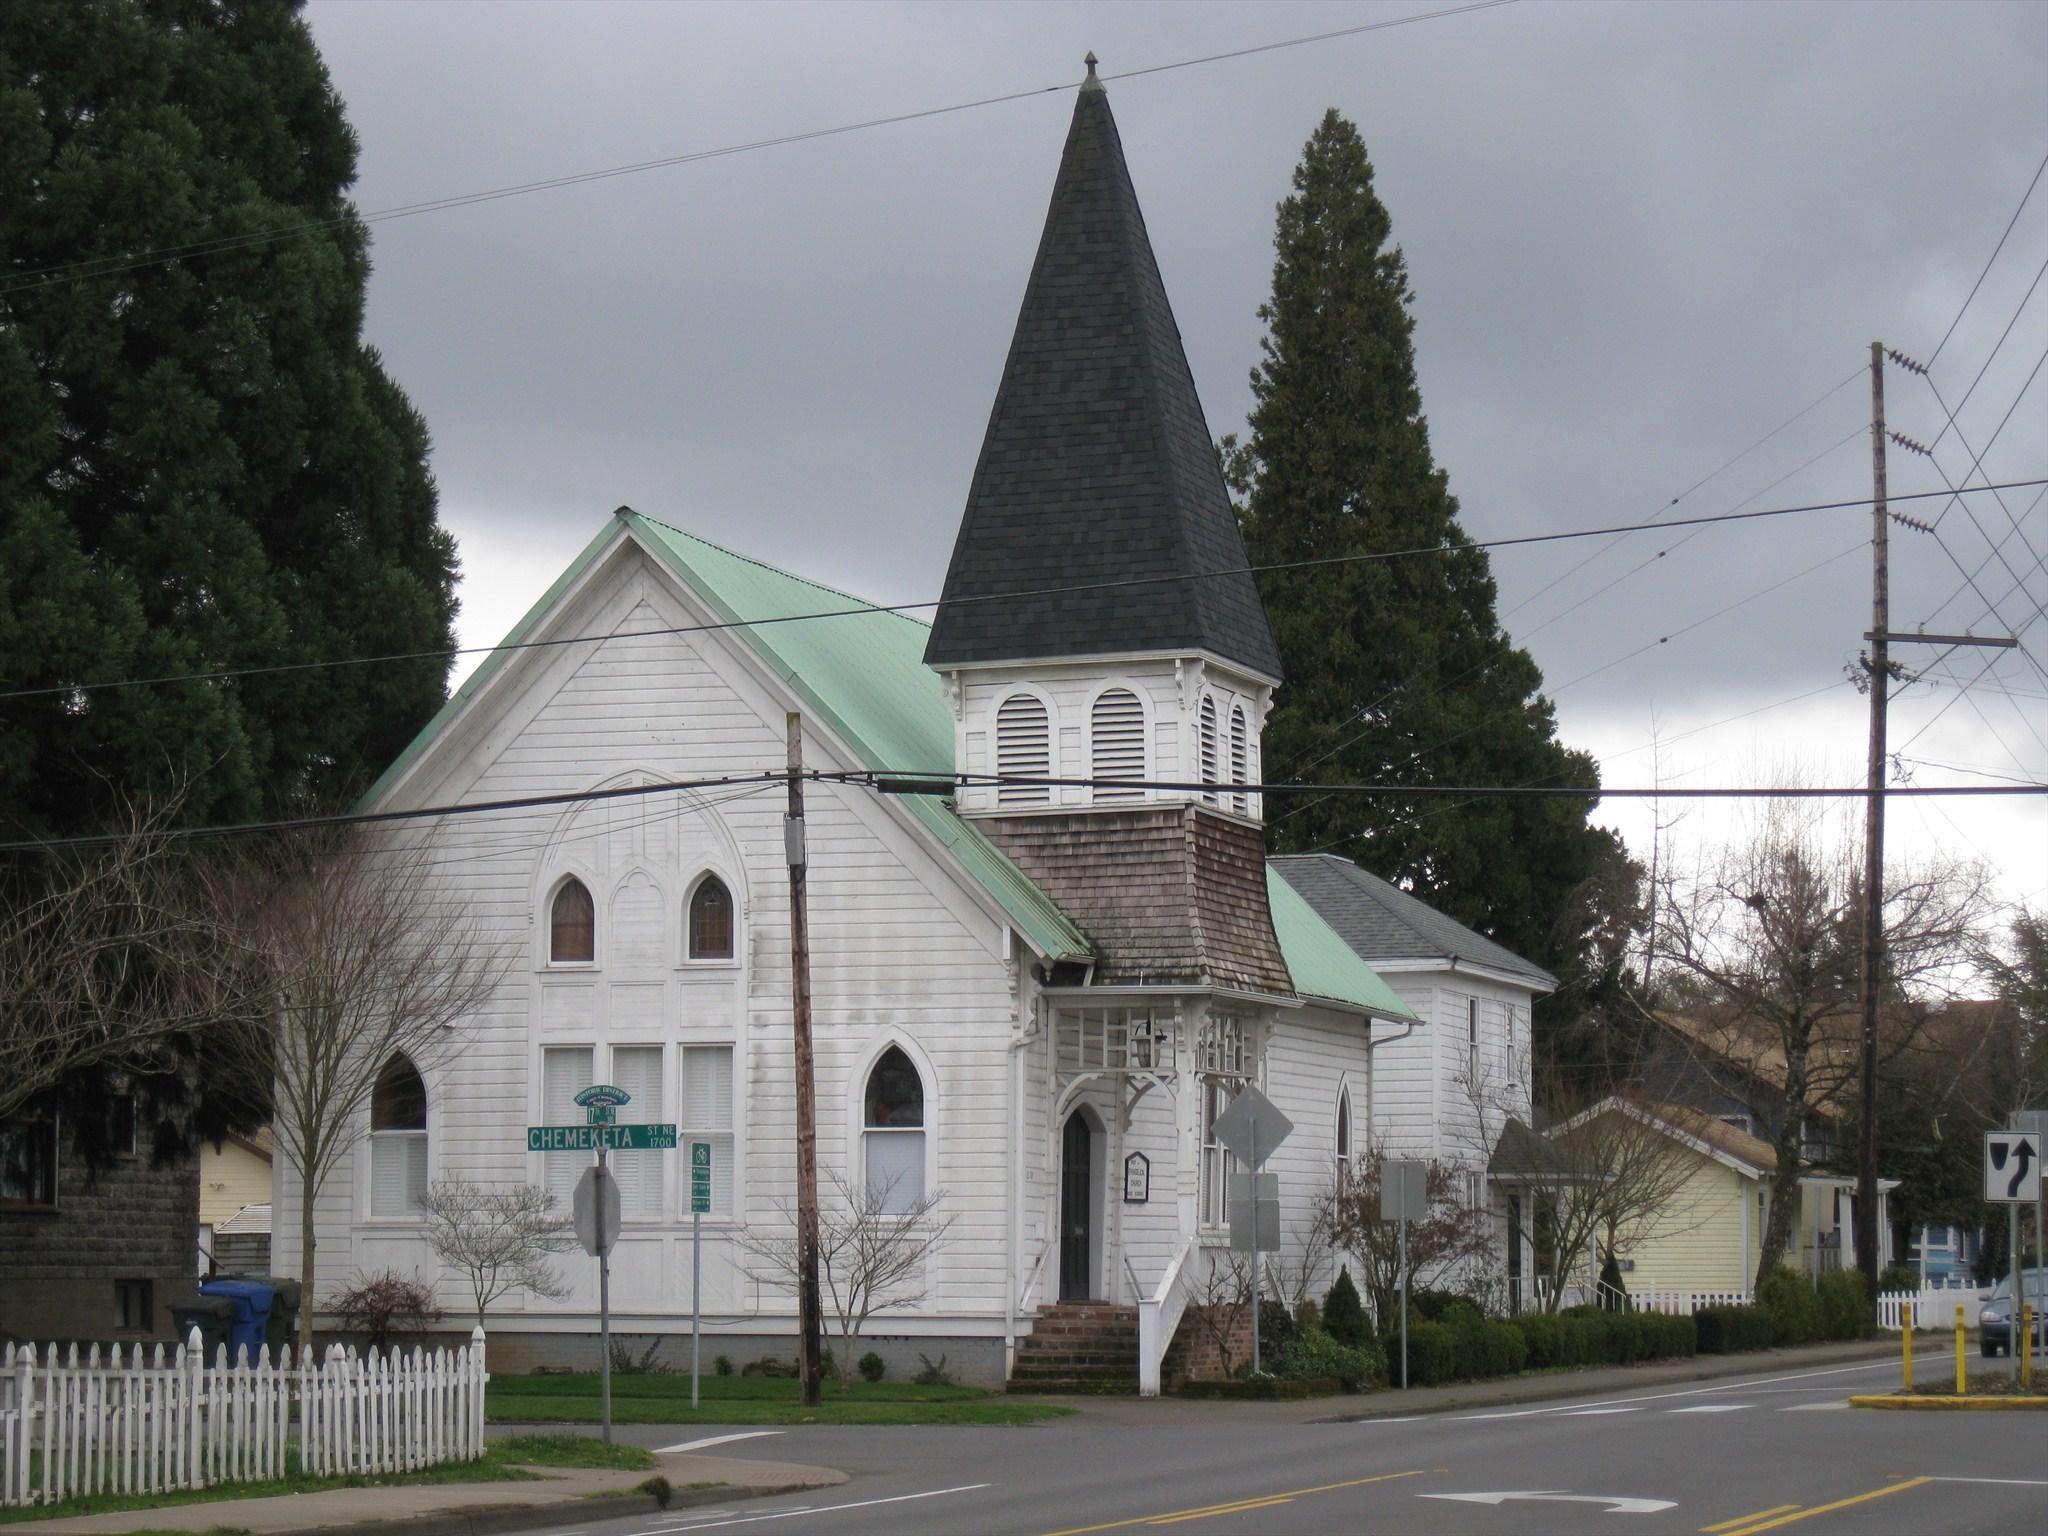 Chemeketa Street Evangelical Church Court Street